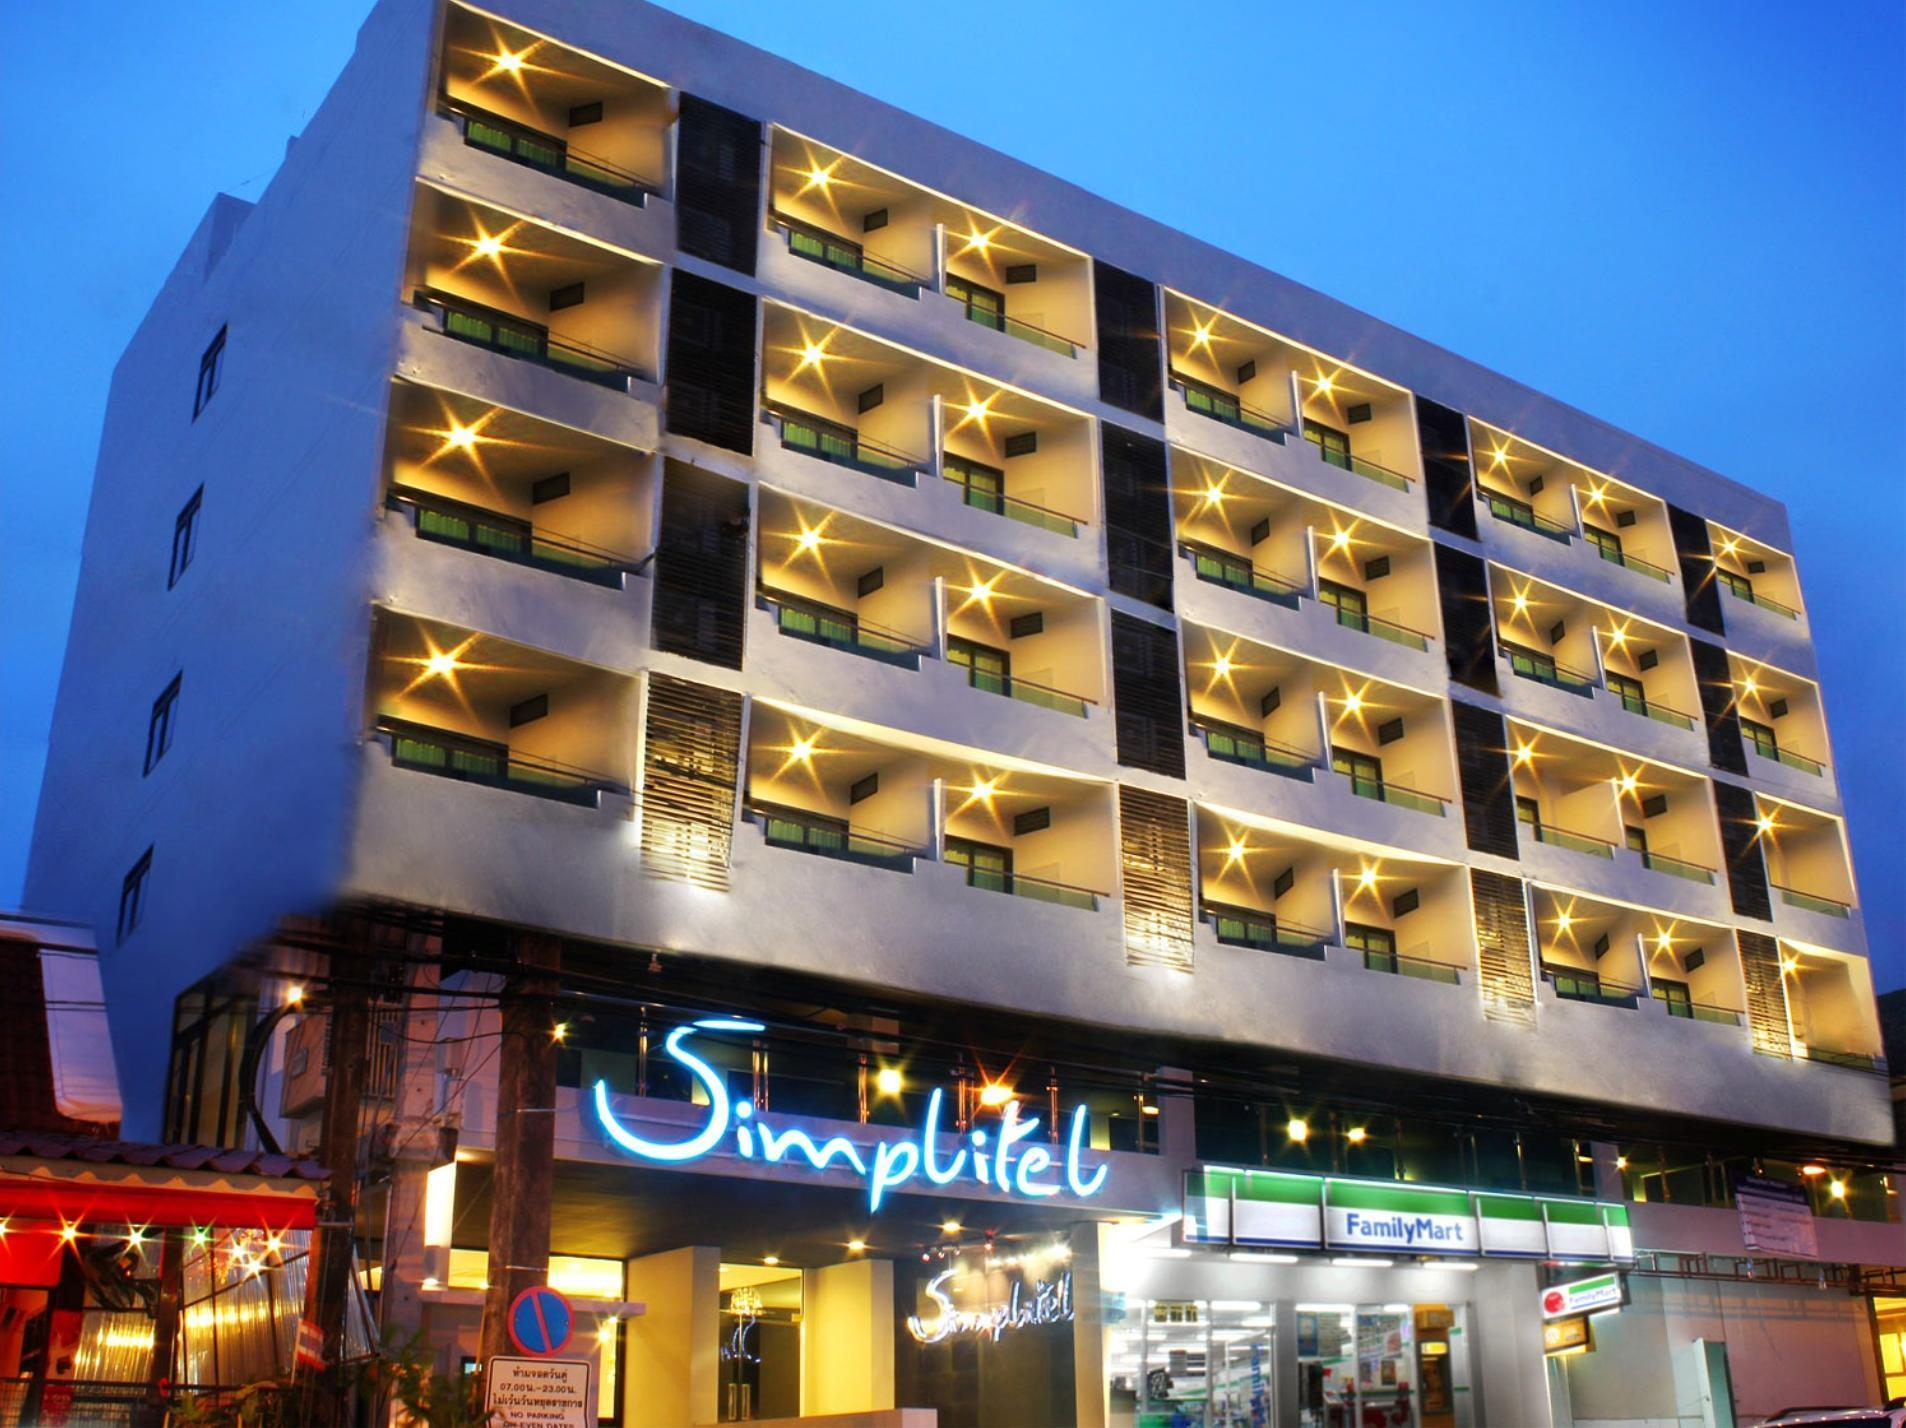 Simplitel Hotel - Phuket